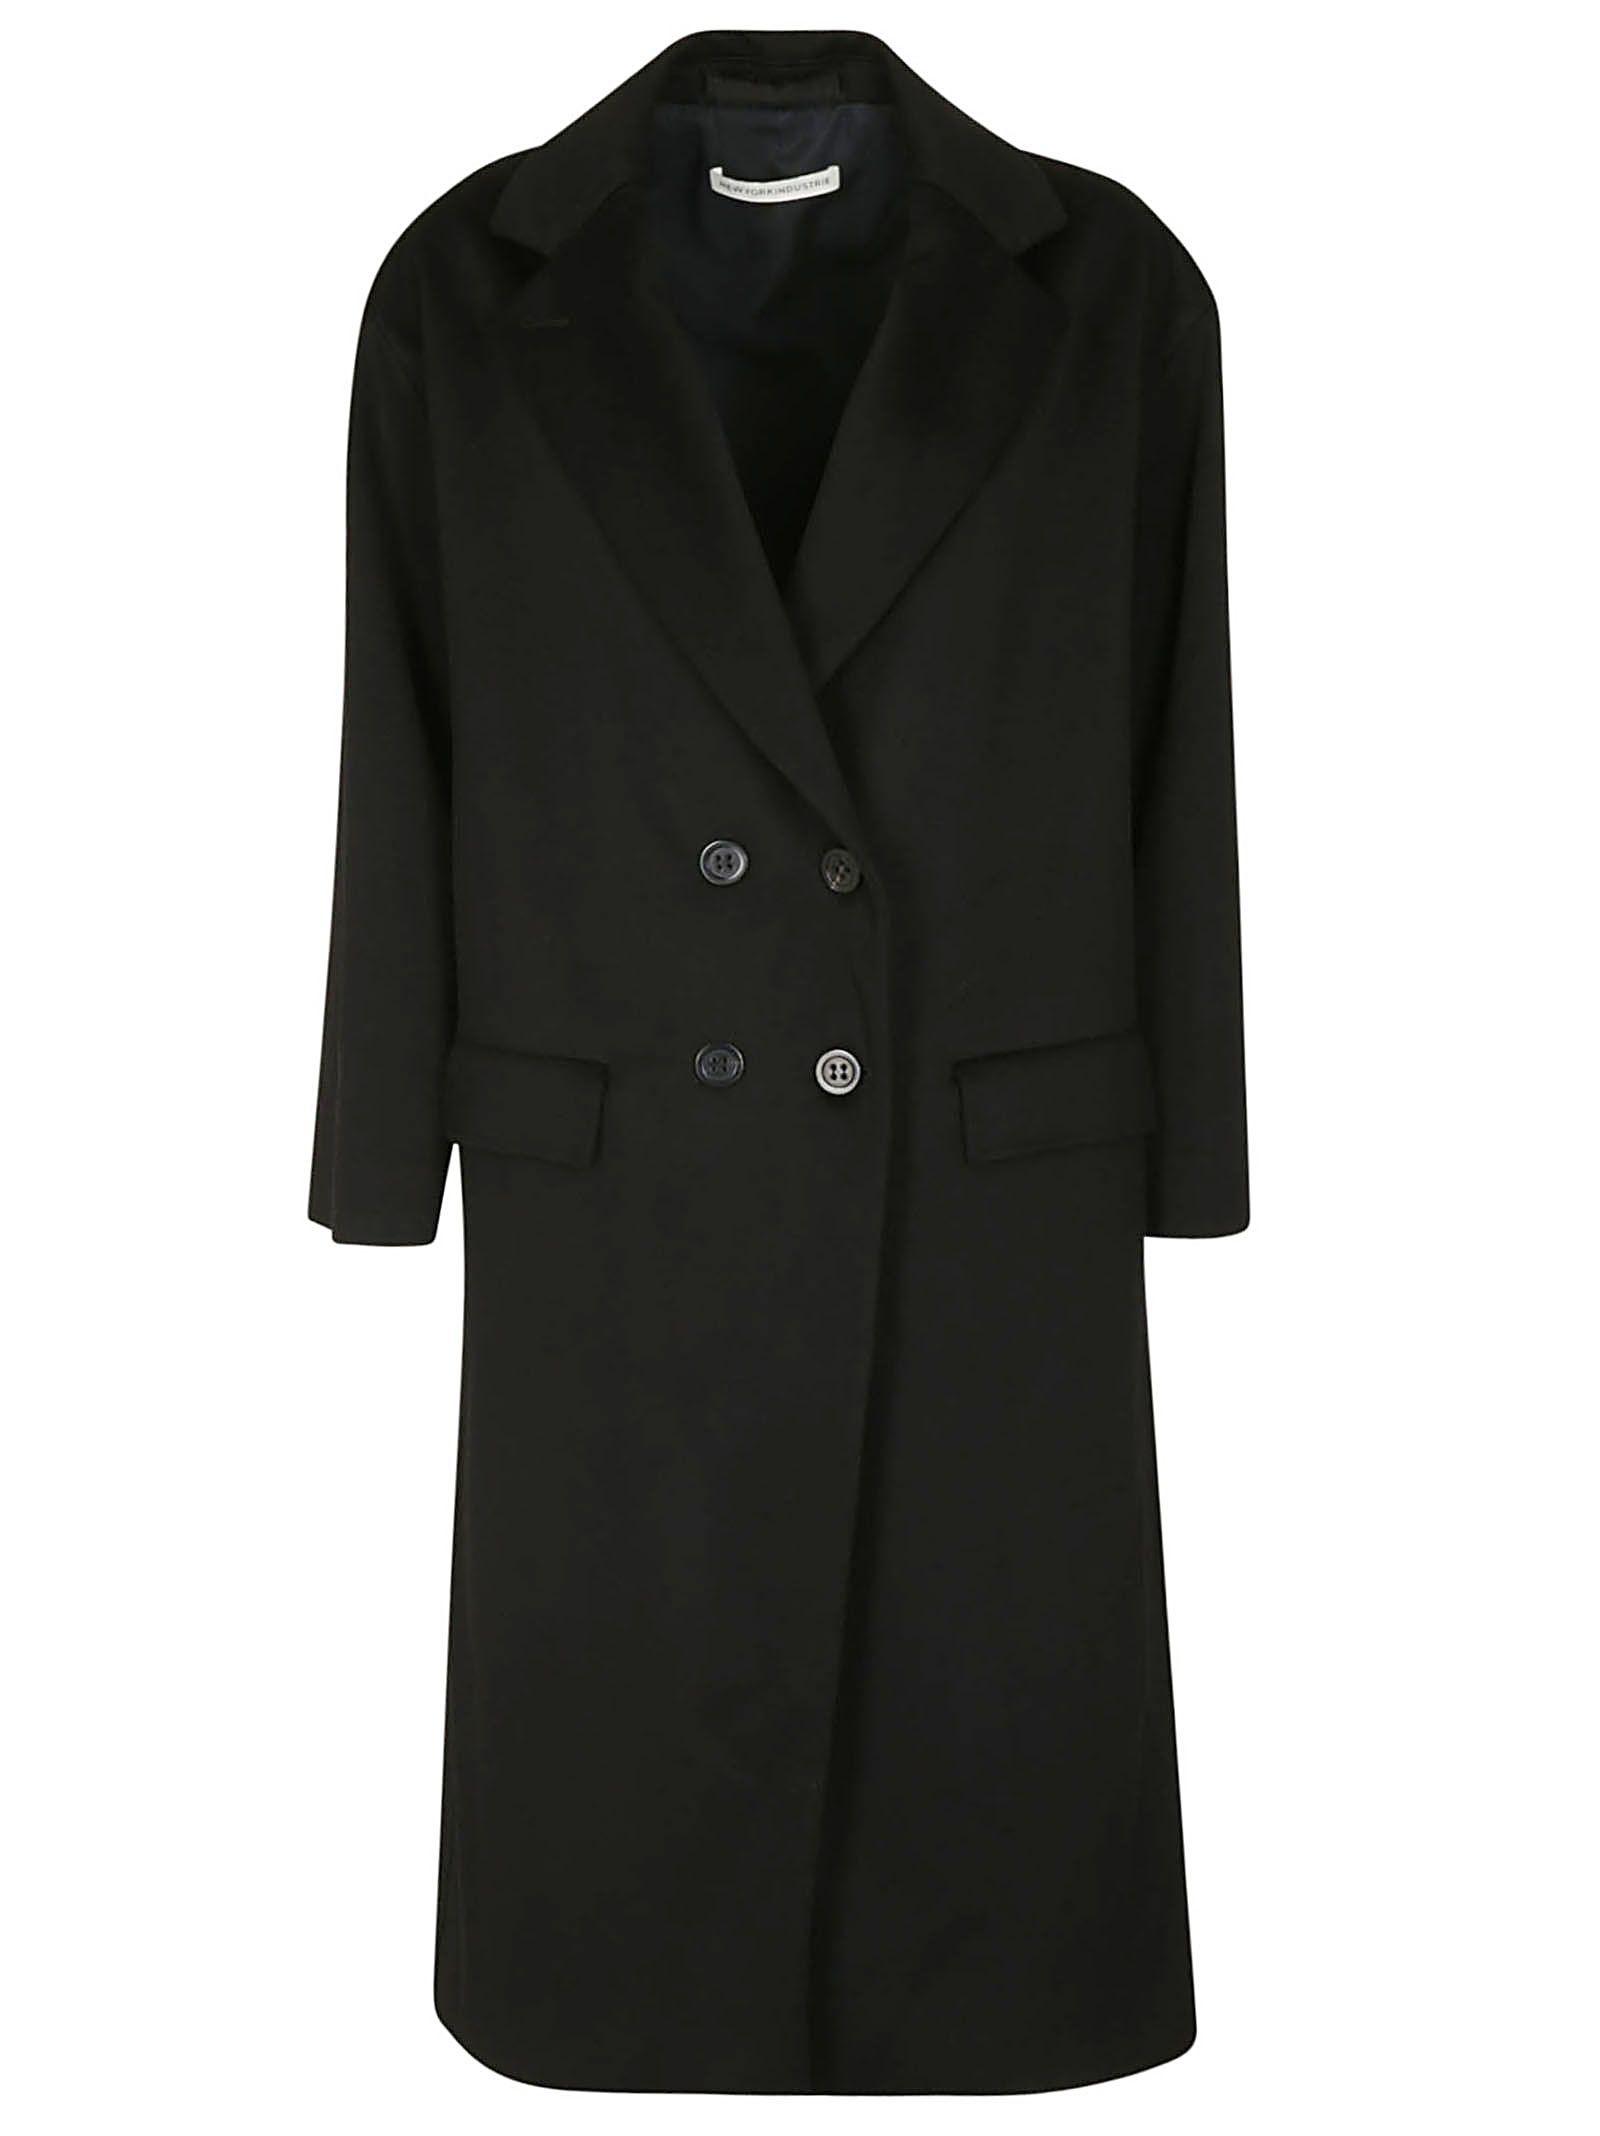 NEWYORKINDUSTRIE New York Industrie Double Breasted Coat in Black